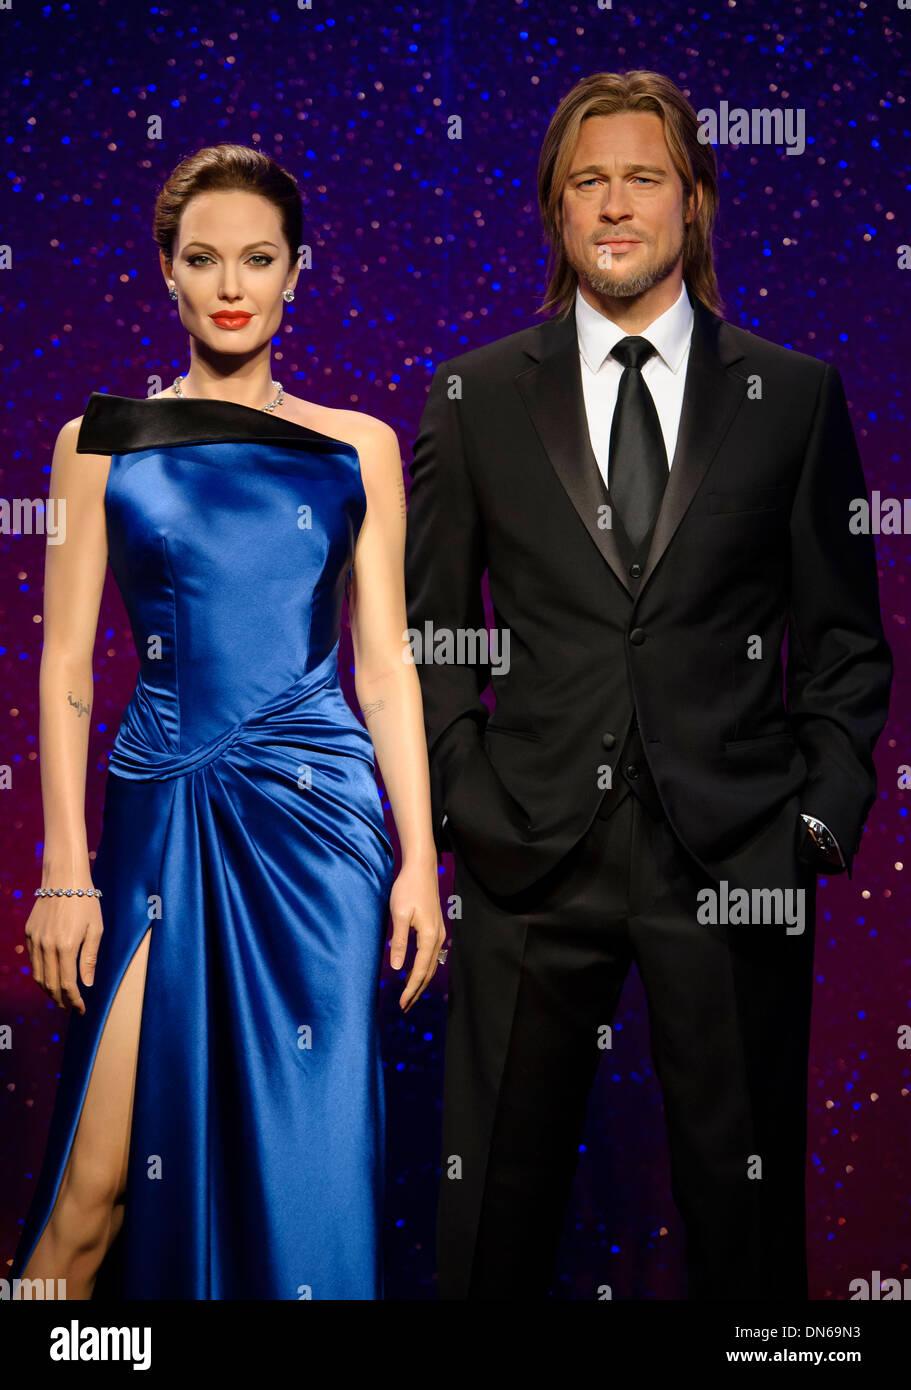 Le waxworks de Brad Pitt et Angelina Jolie chez Madame Tussaud de Londres. Photo Stock